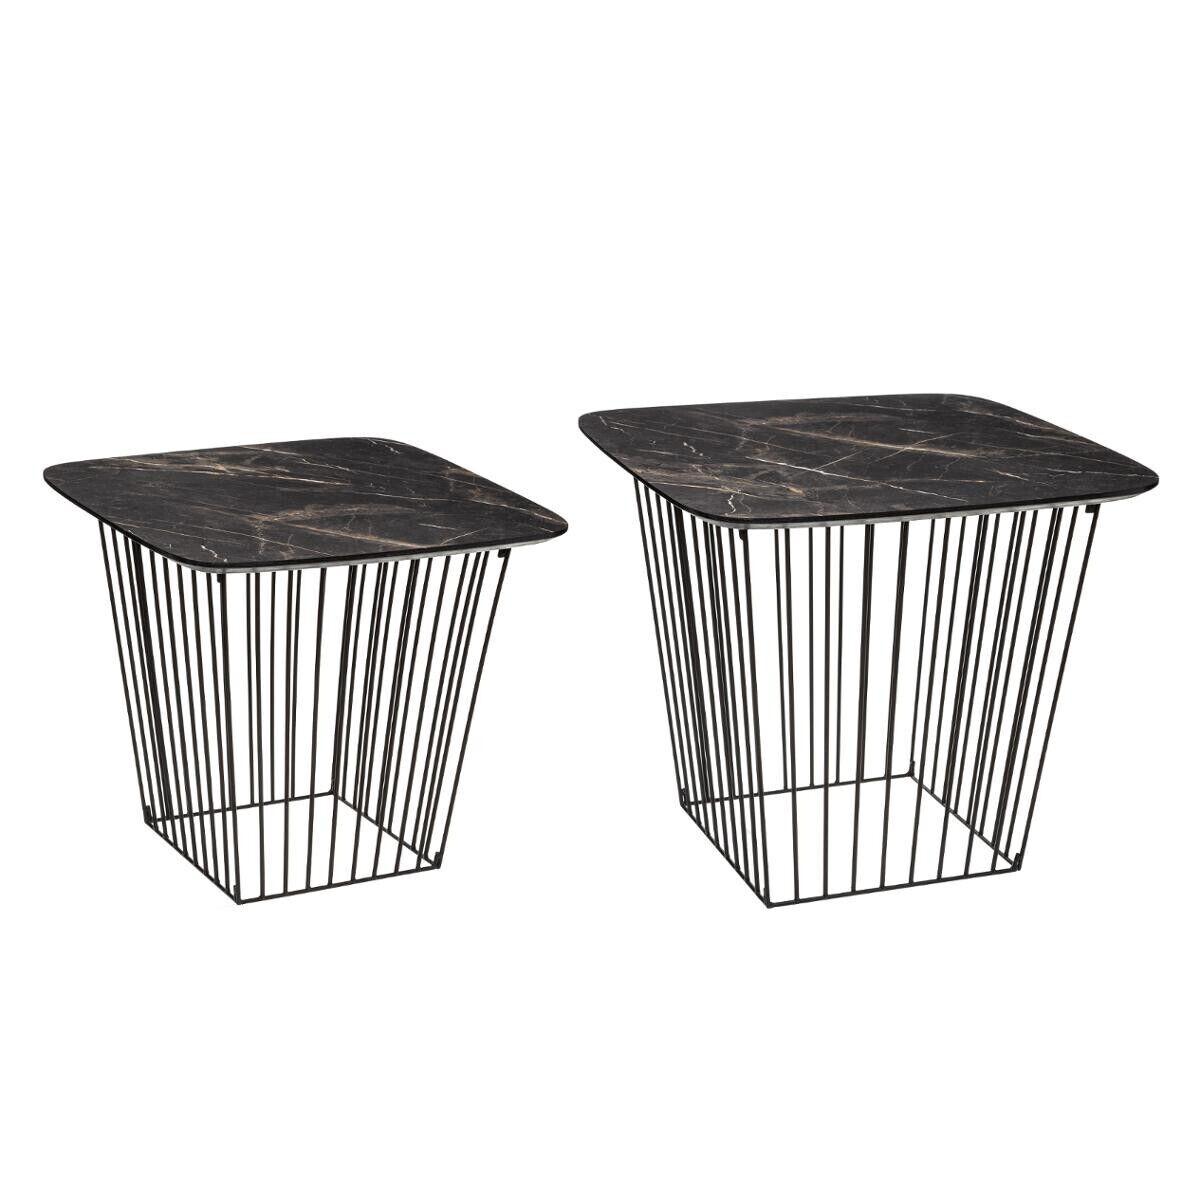 "Atmosphera Lot de 2 tables d'appoint gigognes ""Marble"" en bois fer"